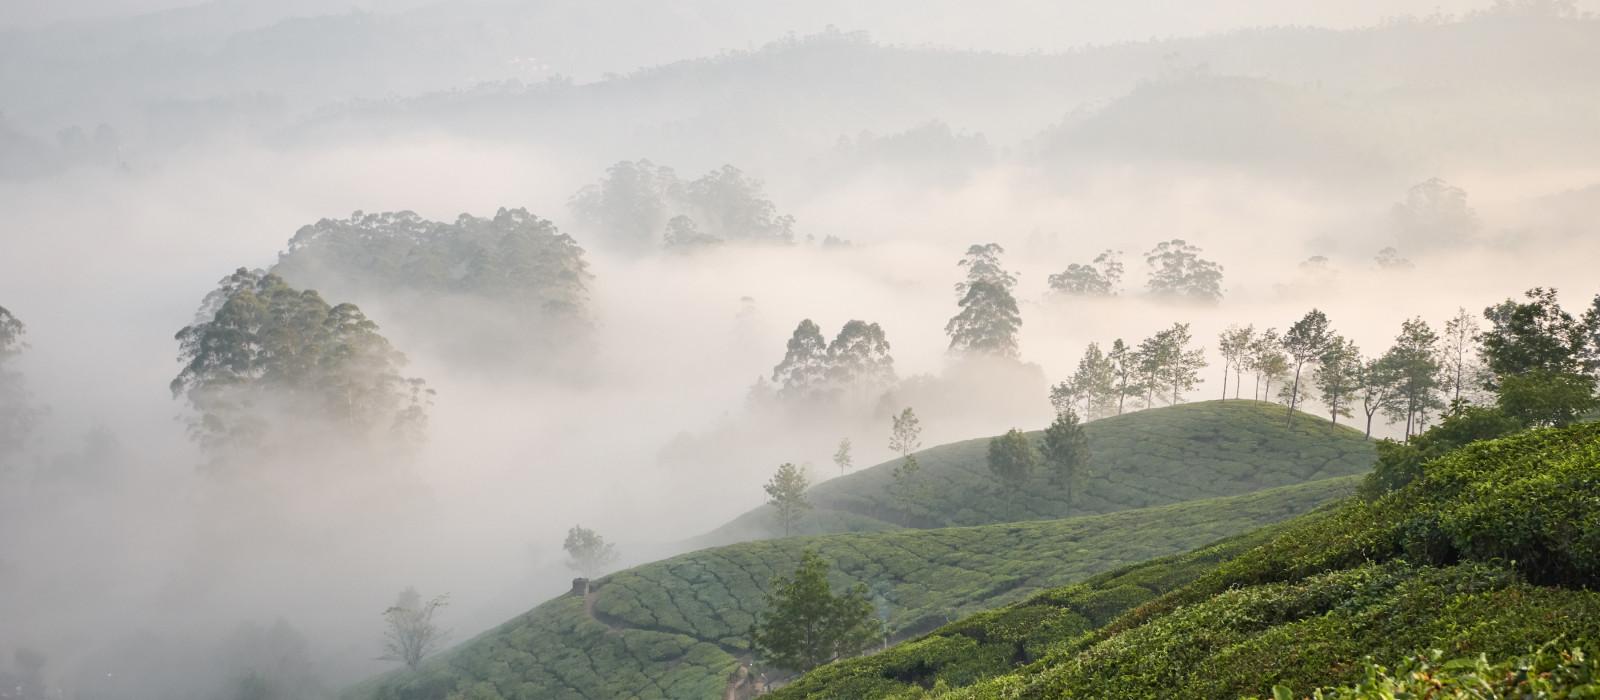 Best view of Munnar, Kerala, India